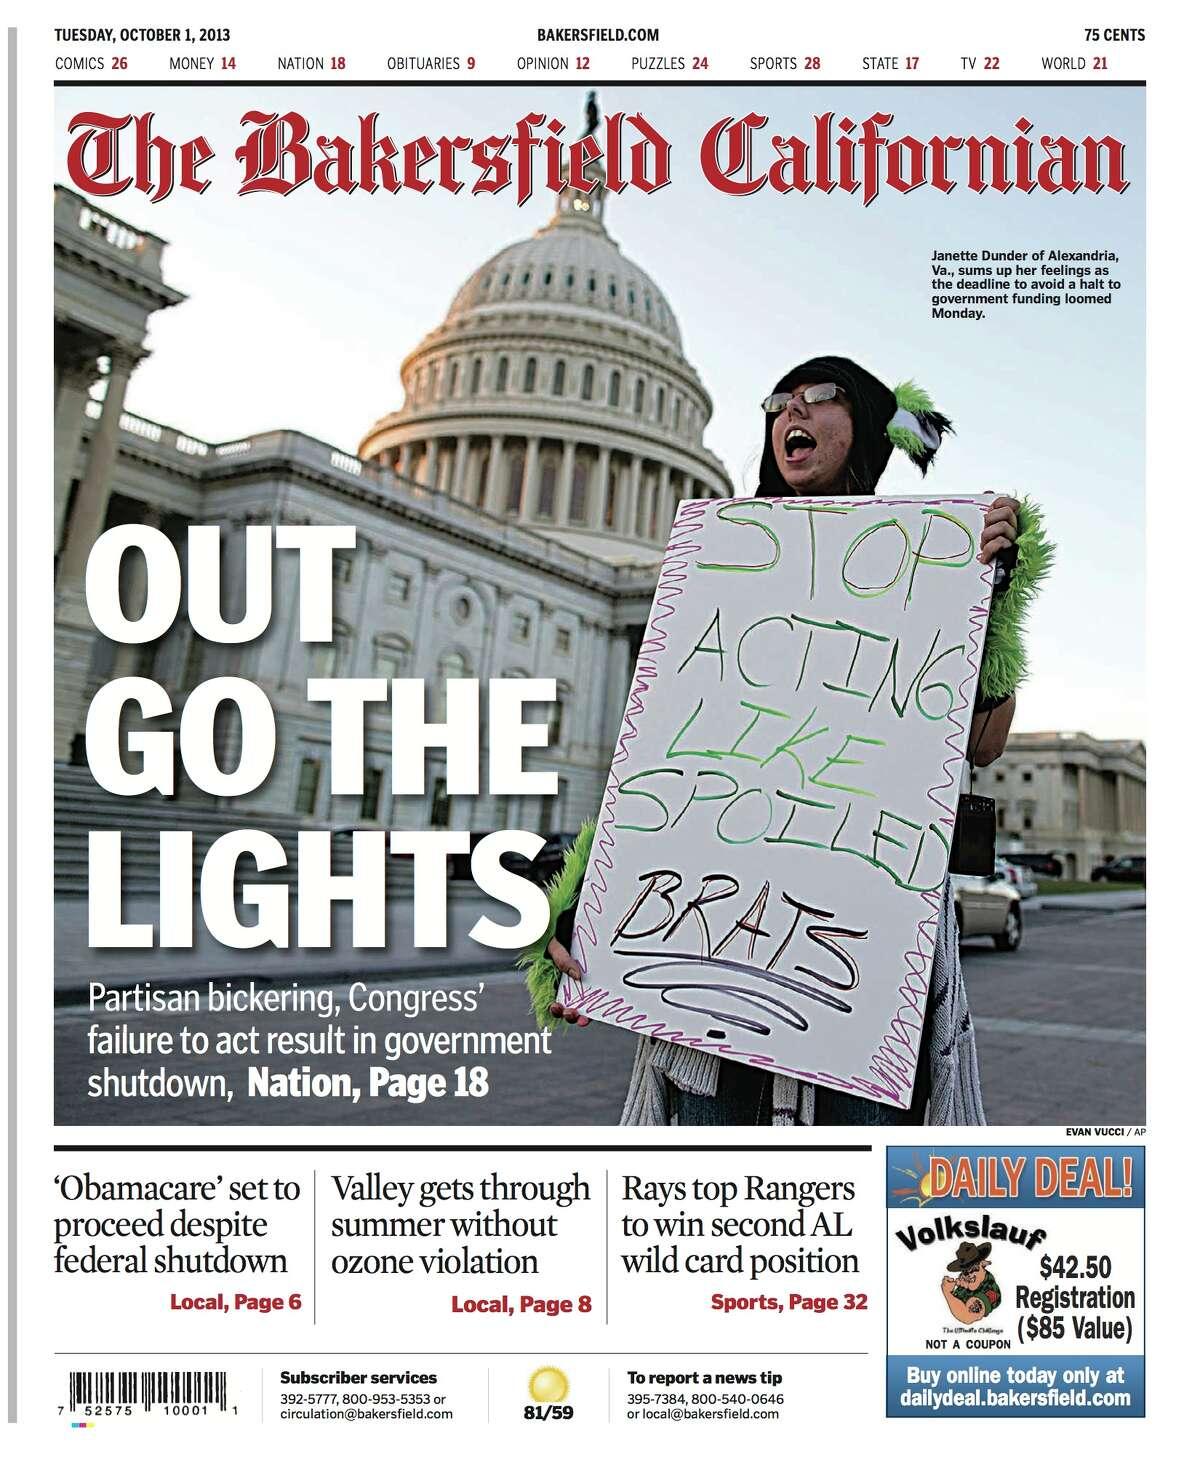 The Bakersfield Californian